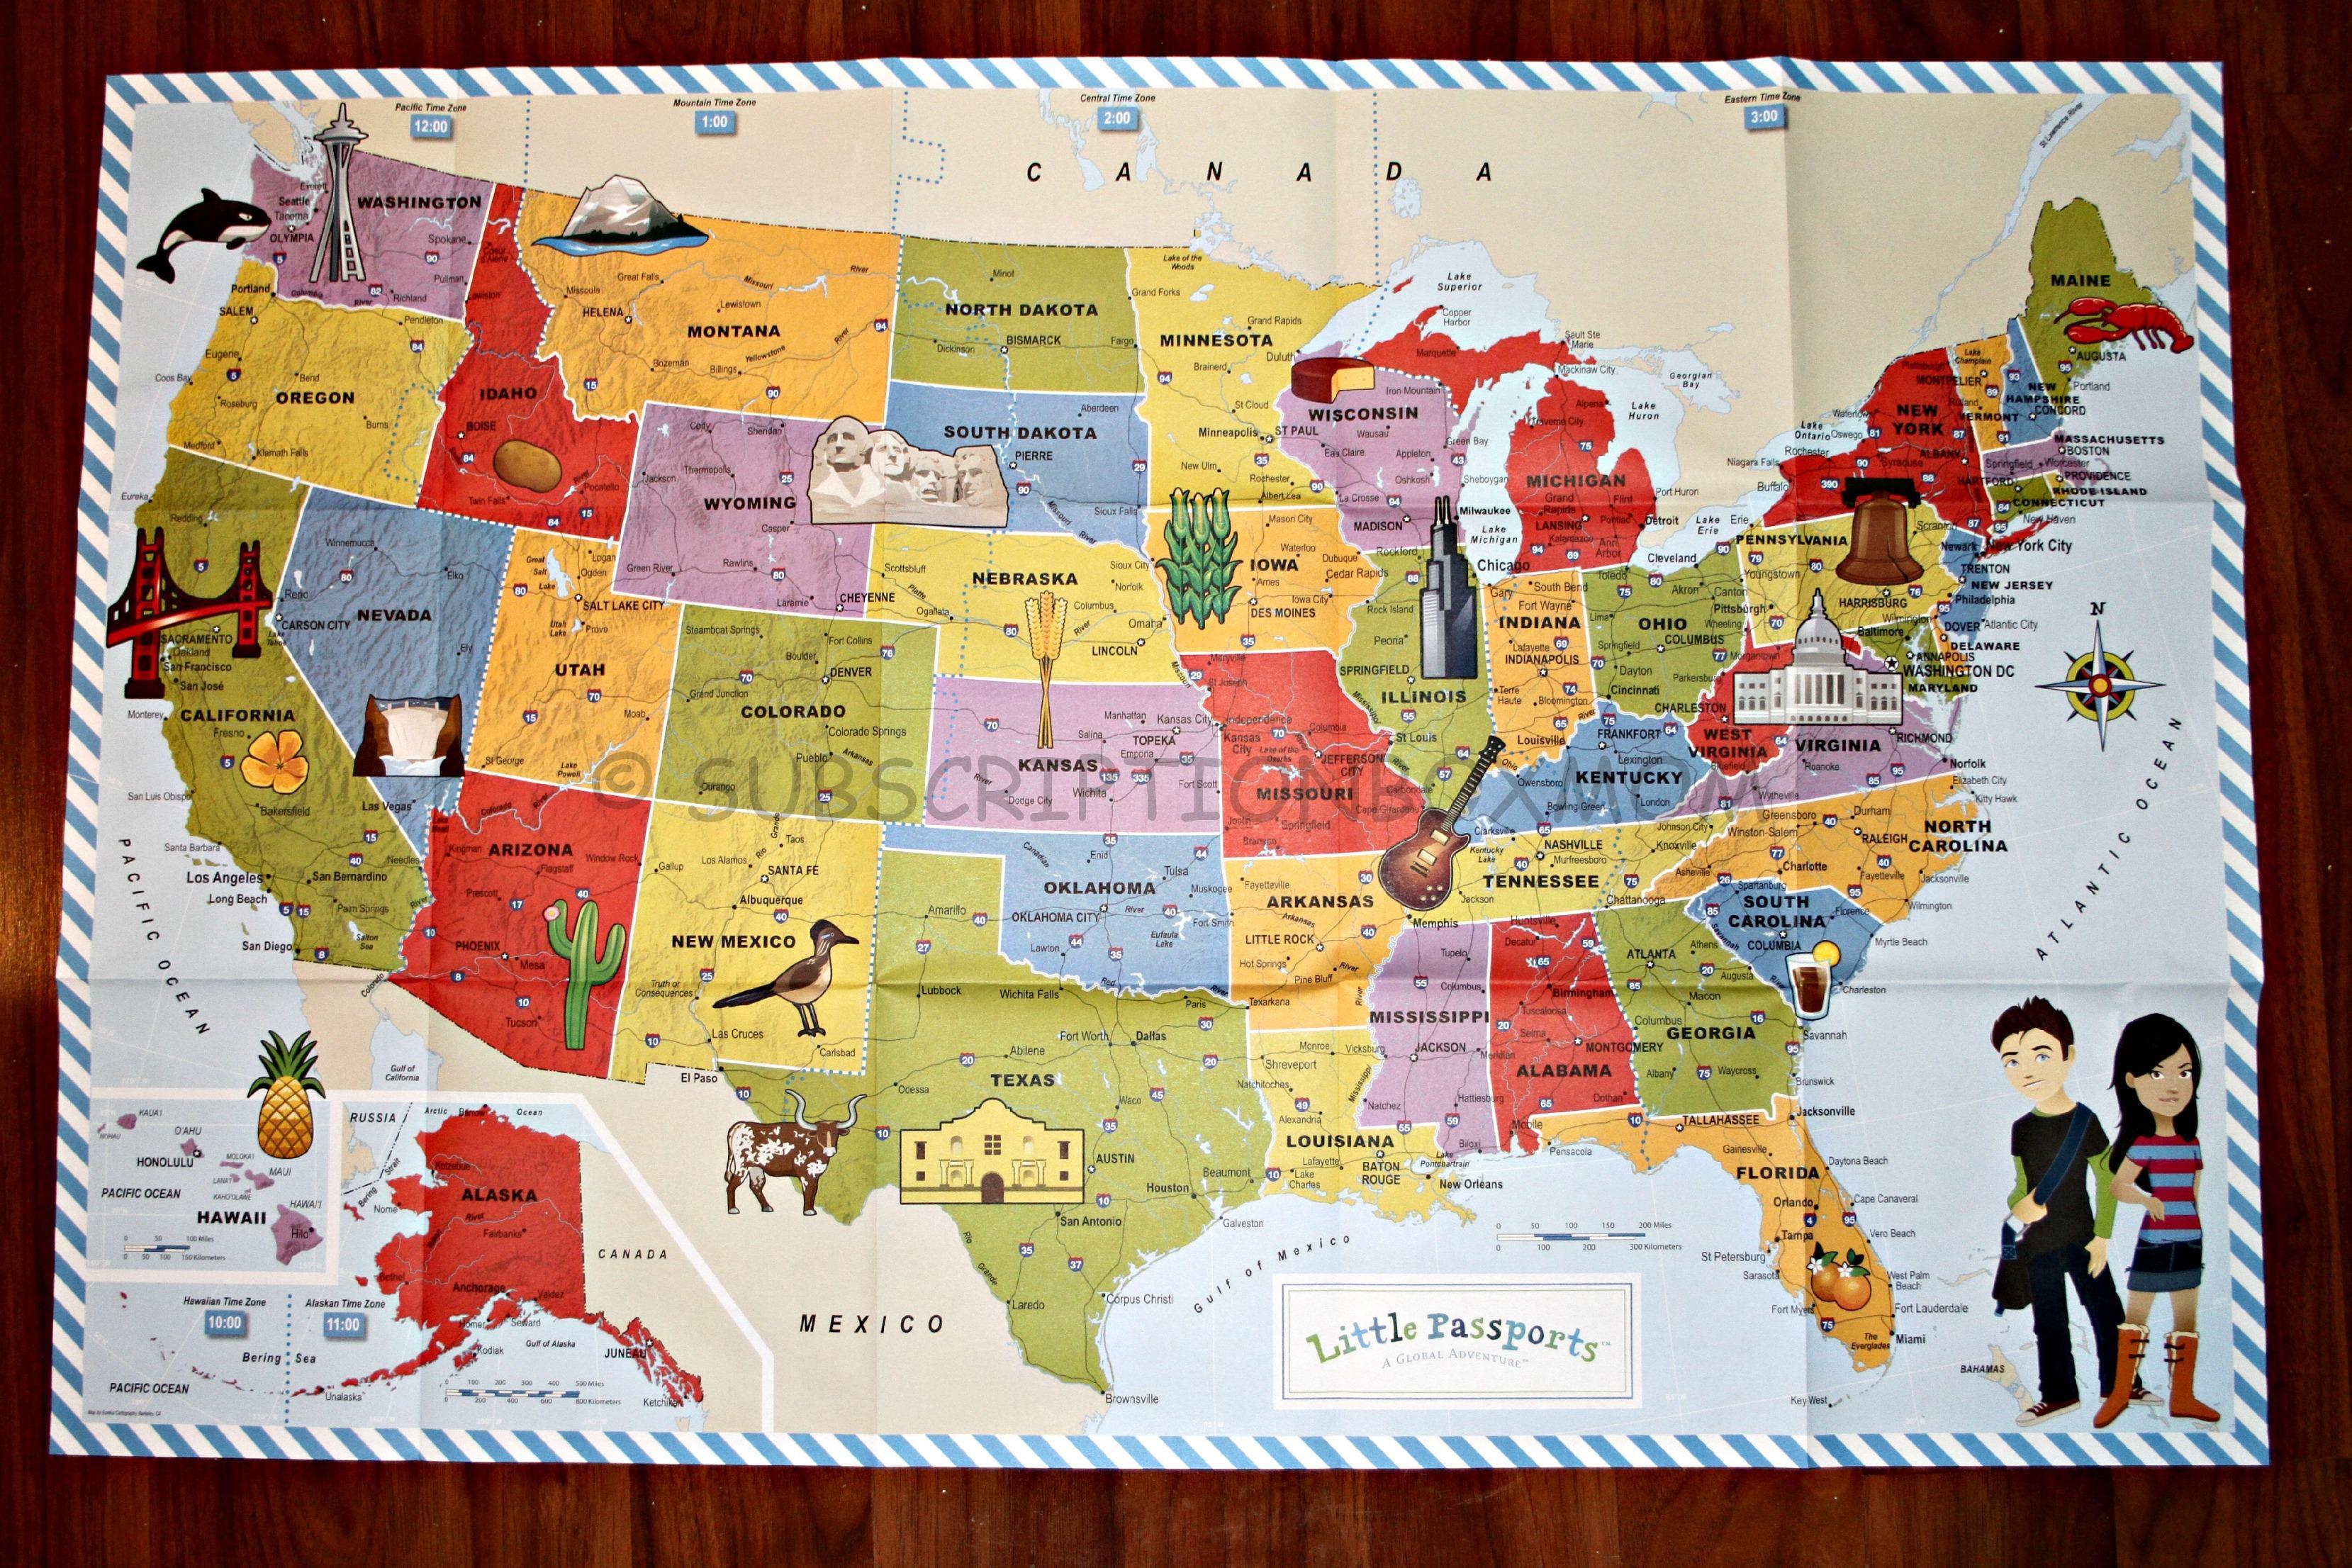 map us landmarks passports usa edition discovery kit review subscription box map us landmarks passports usa